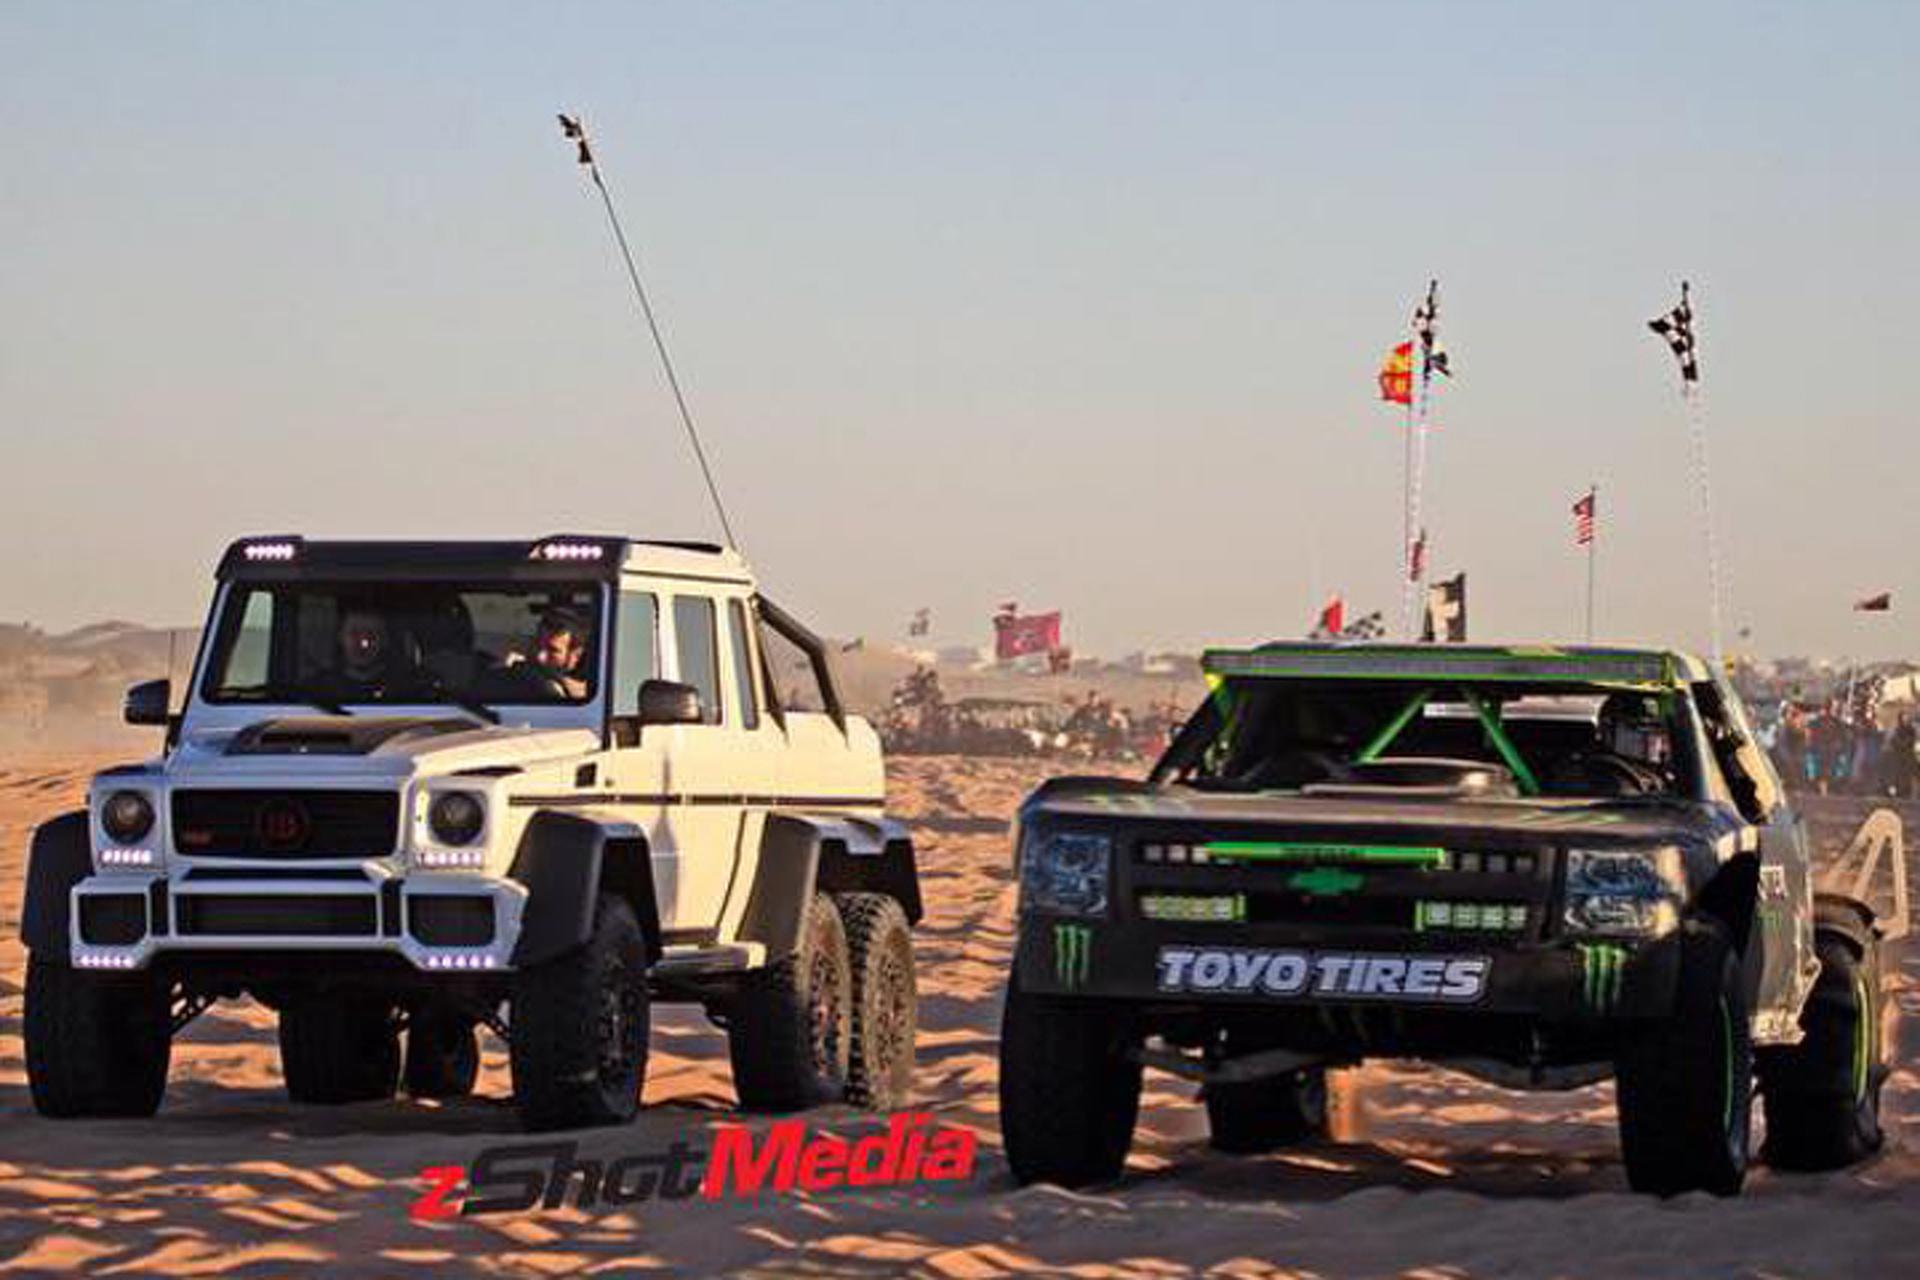 Dan Bilzerian Takes His Brabus G63 6x6 to Glamis Sand Dunes